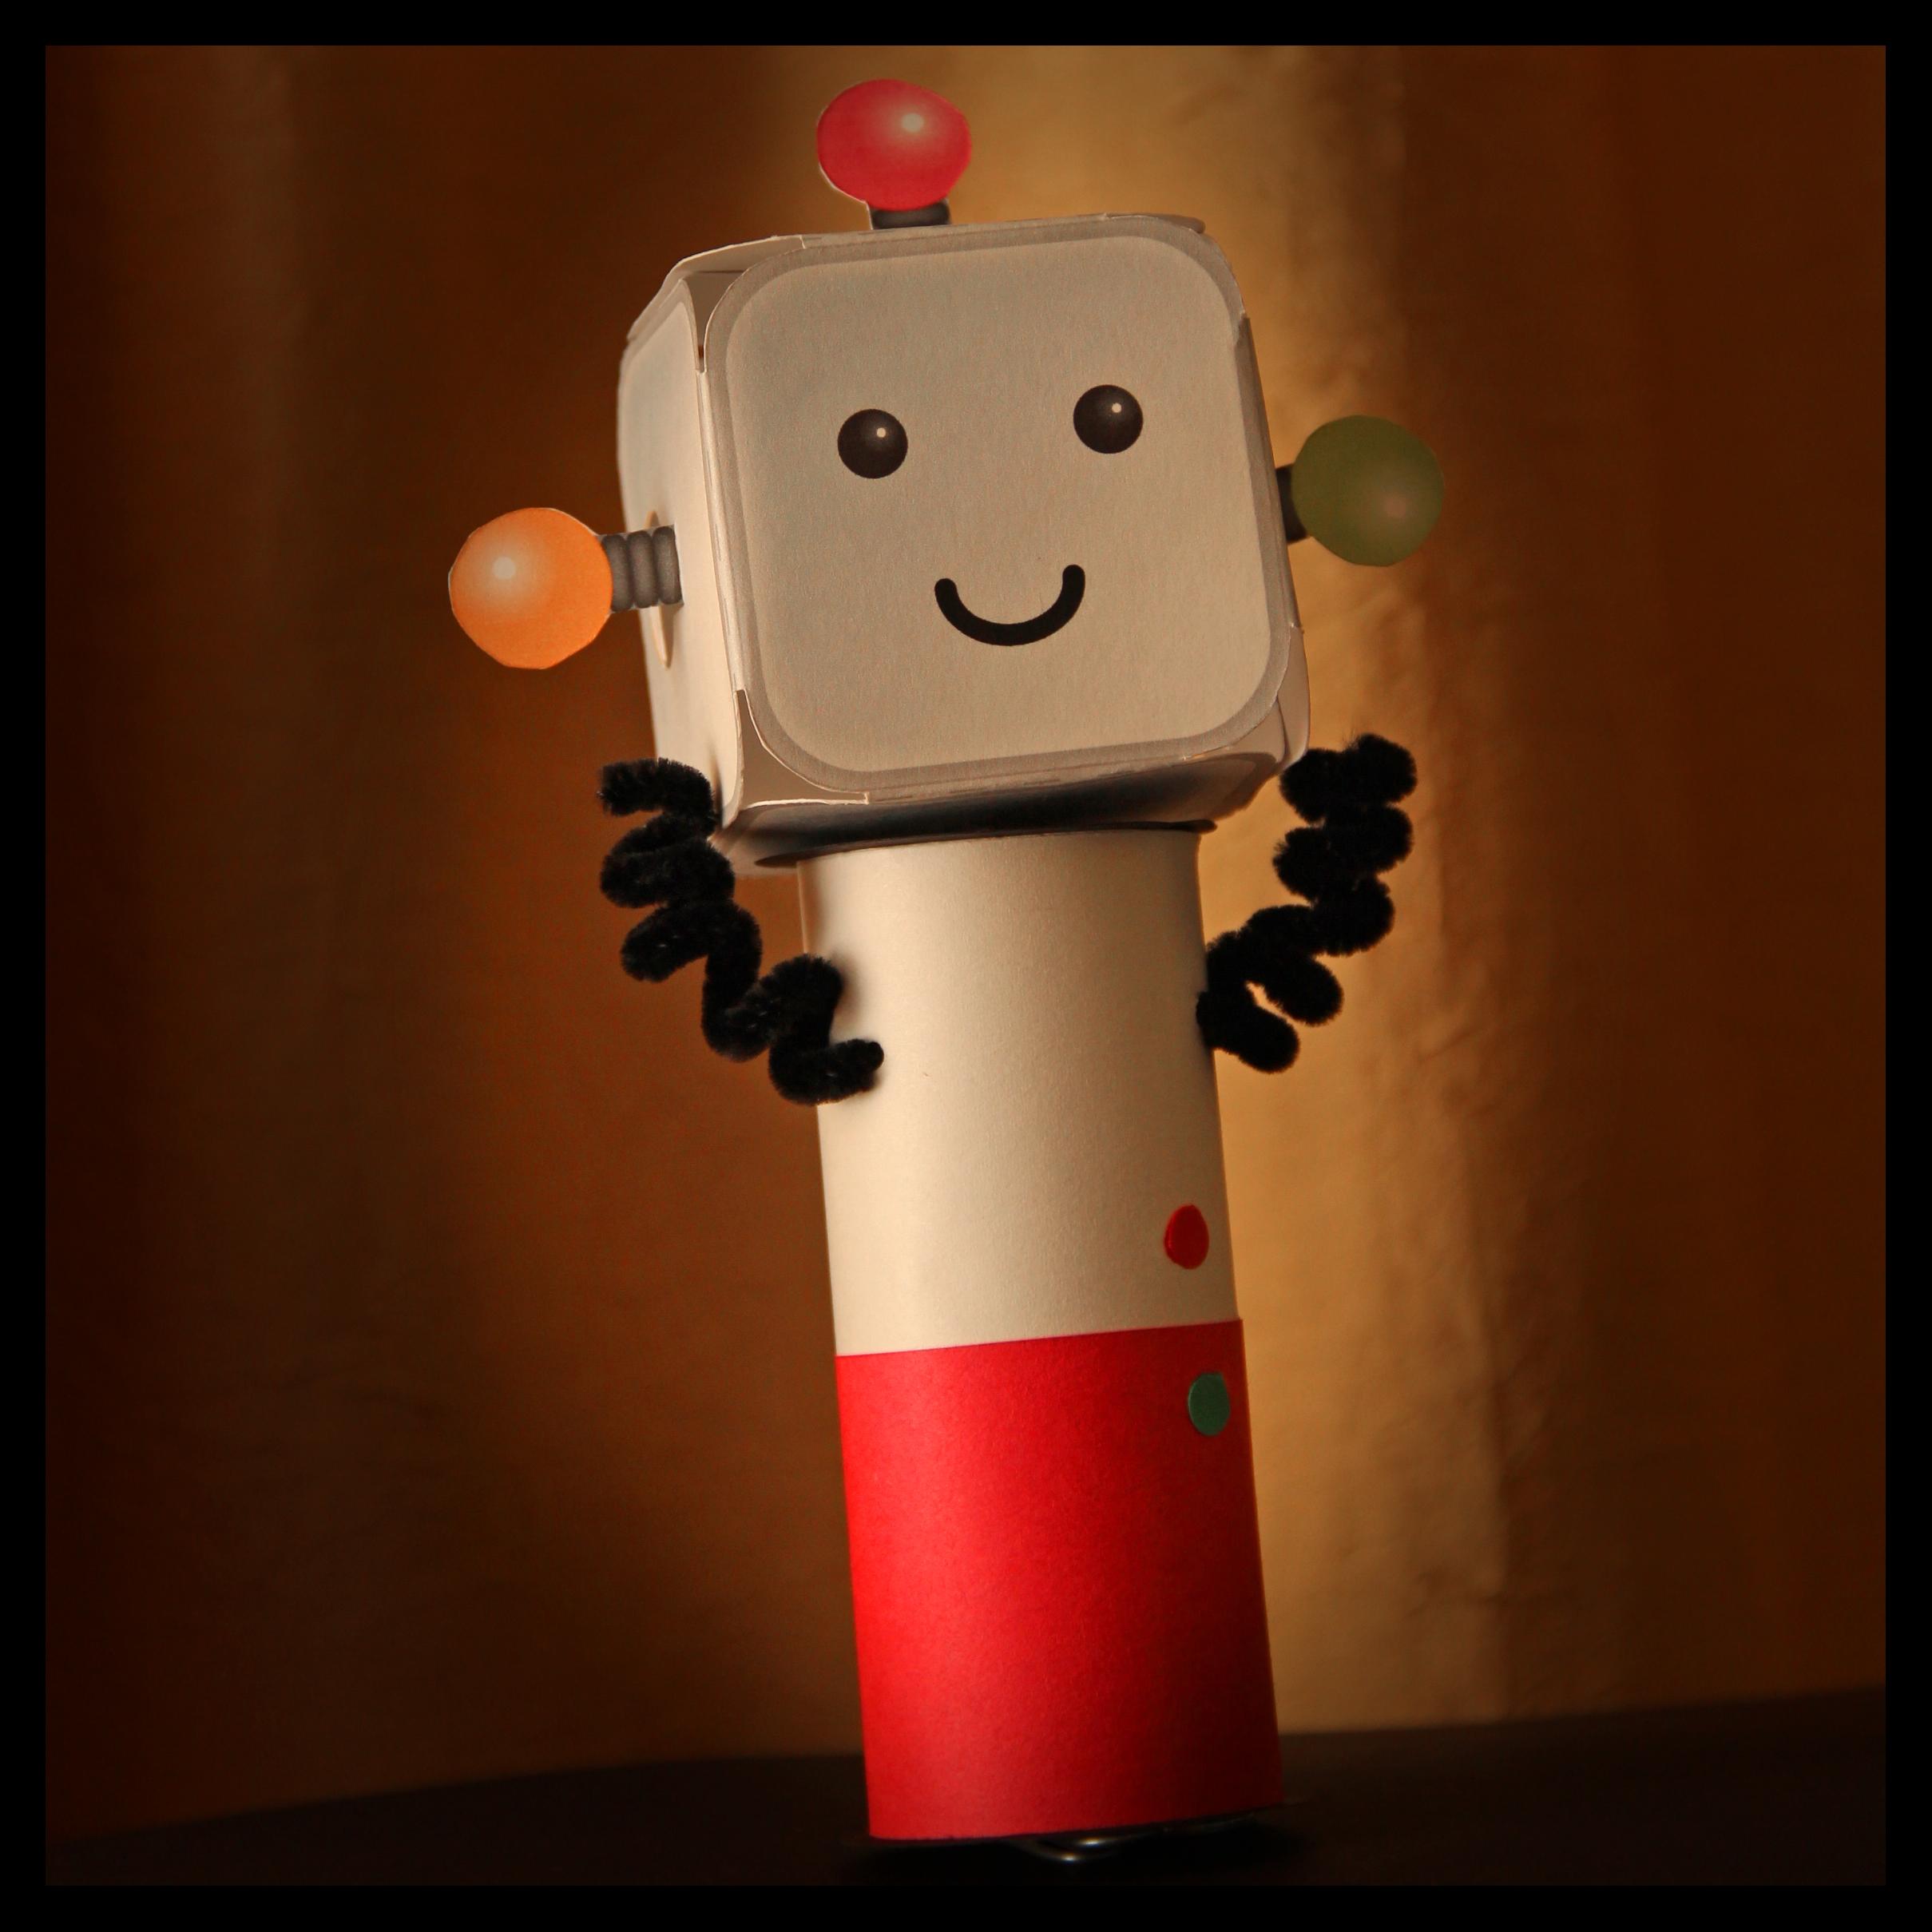 Spinning Robot Toy